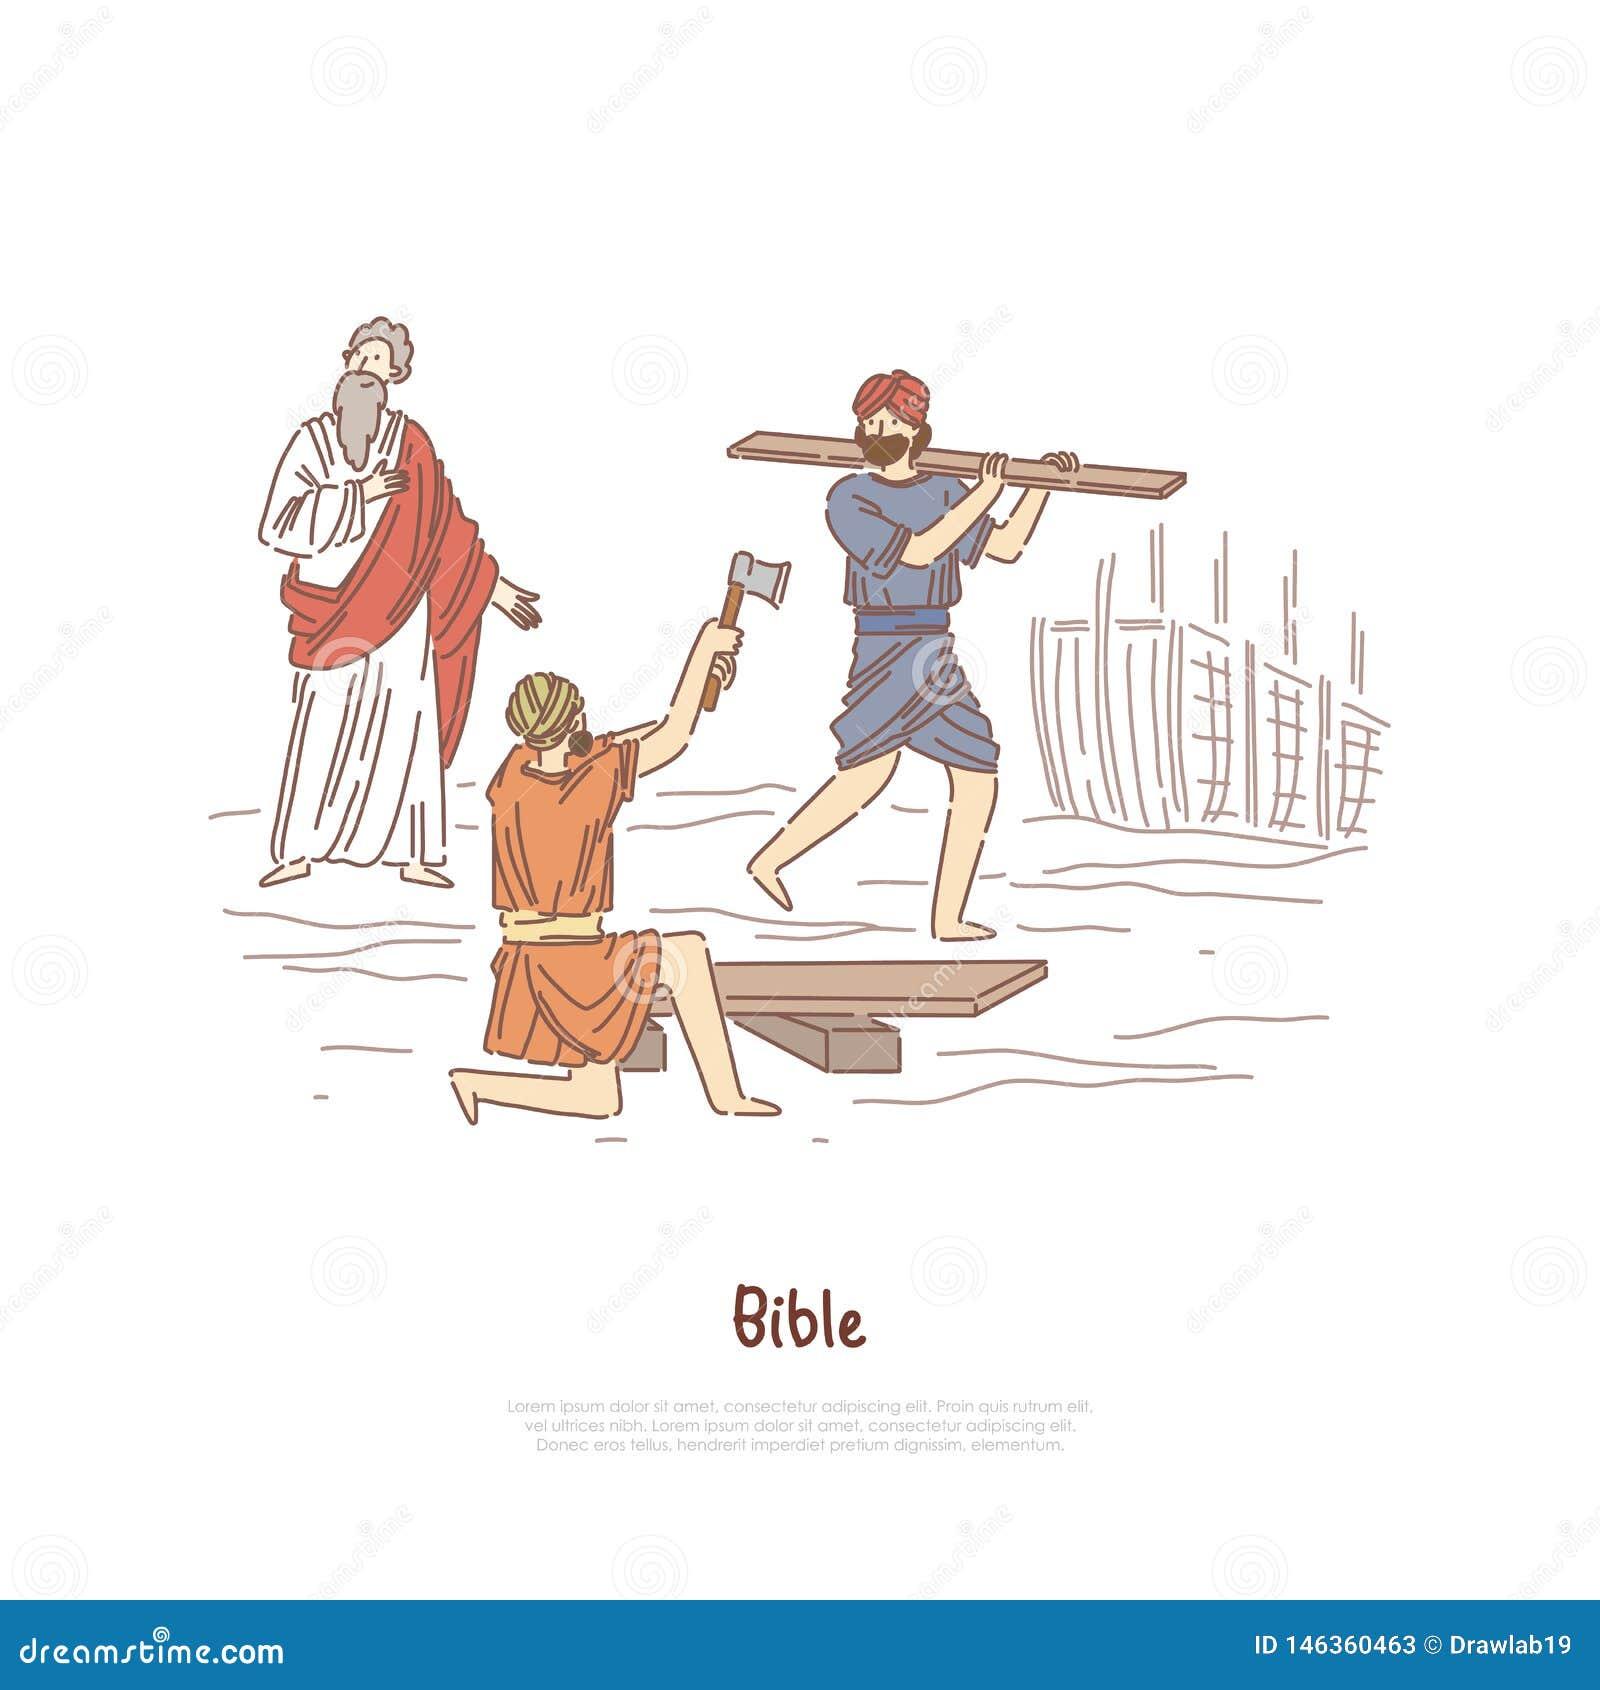 Noah Building Ark Myth, Legend, Bible Story Plot, Saint Biblical